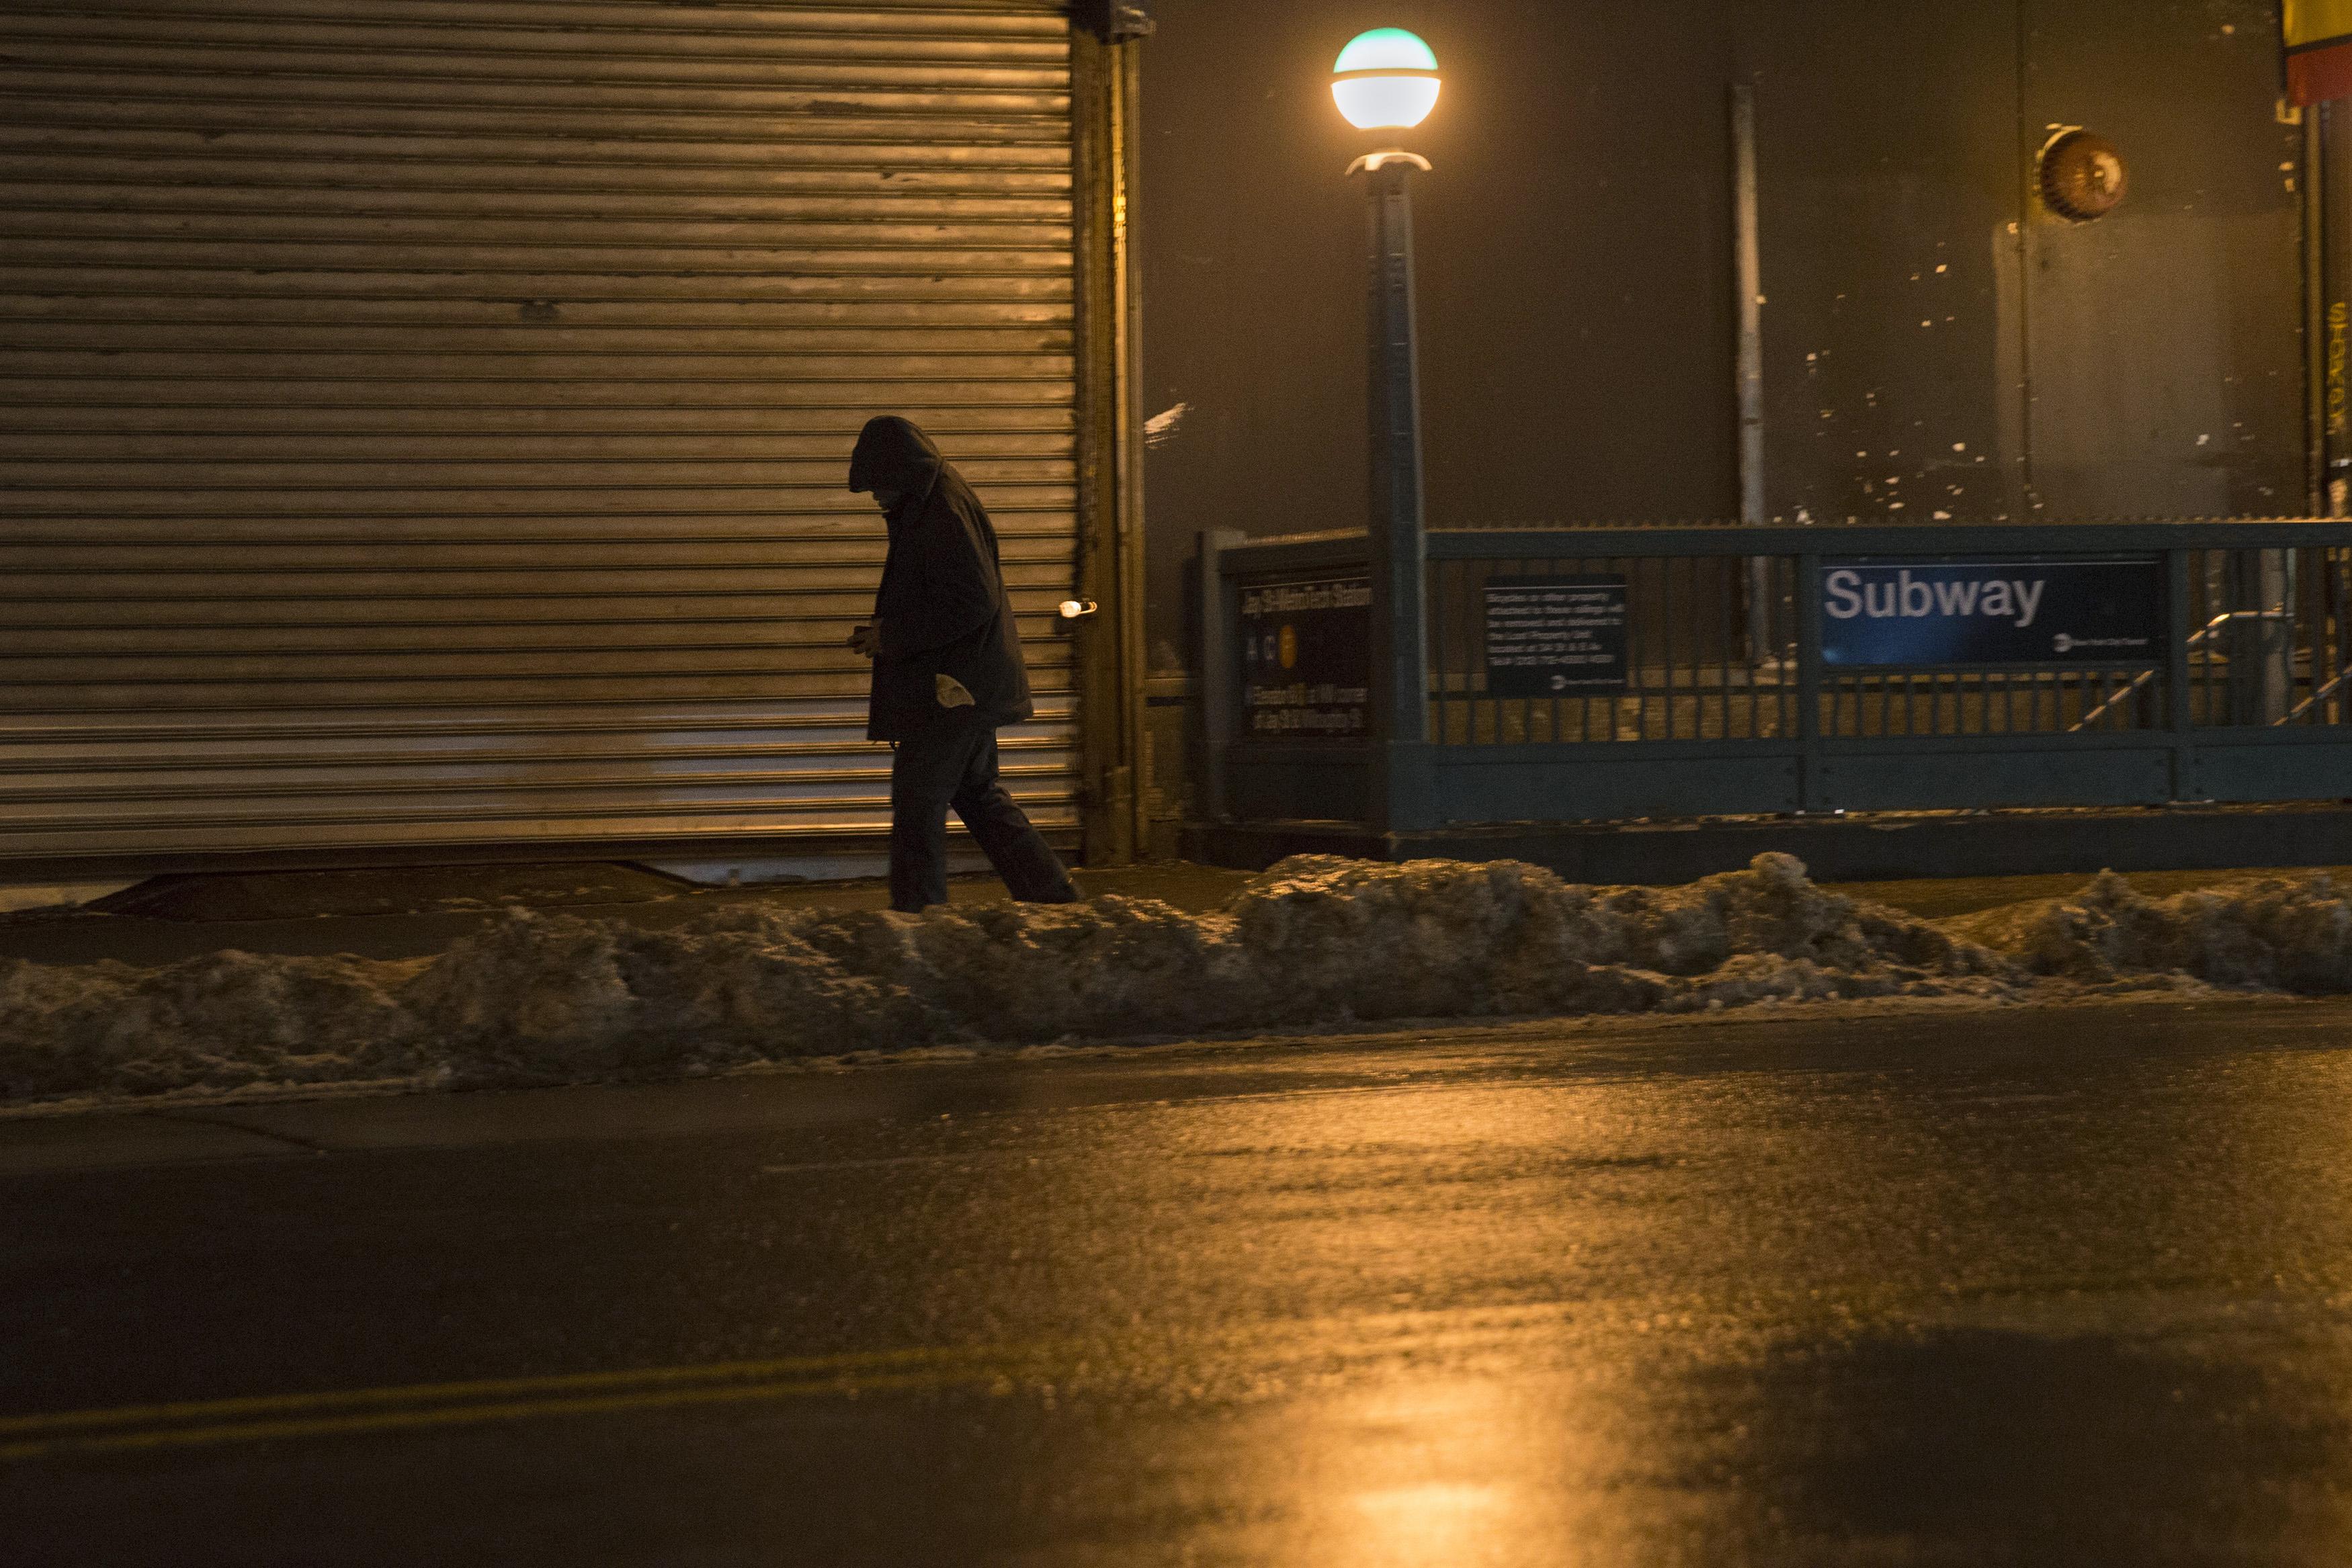 A man walks along the street in the Brooklyn borough of New York